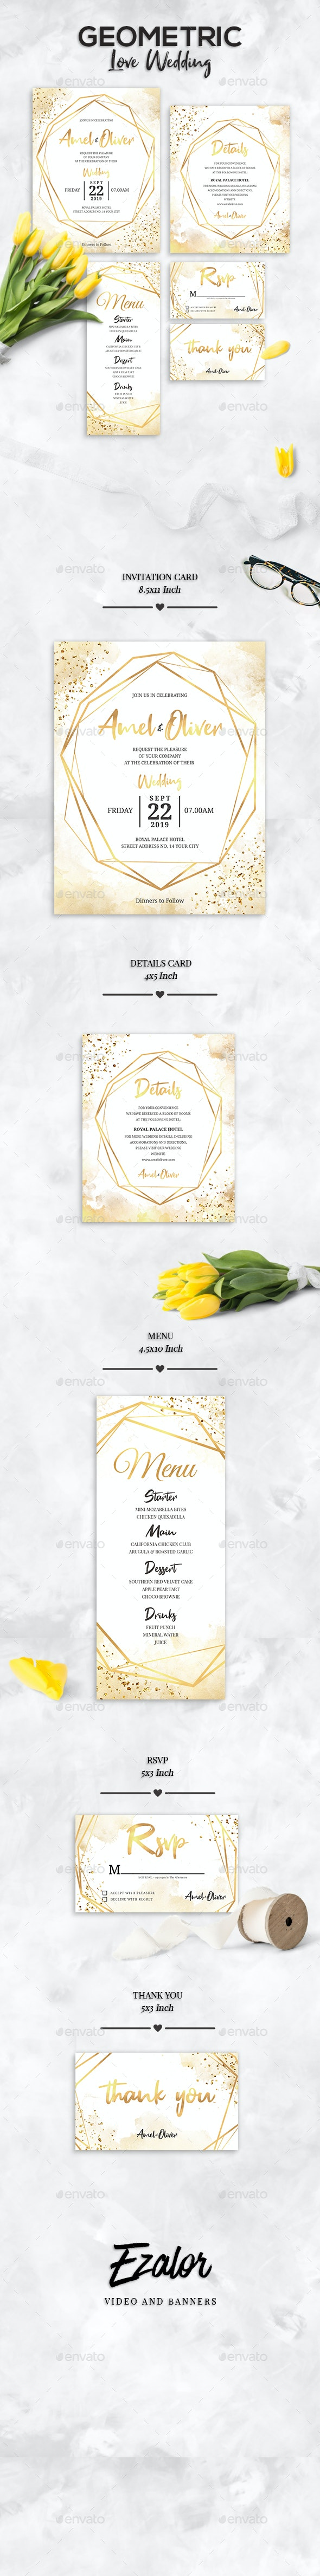 Geometric Wedding Set - Weddings Cards & Invites